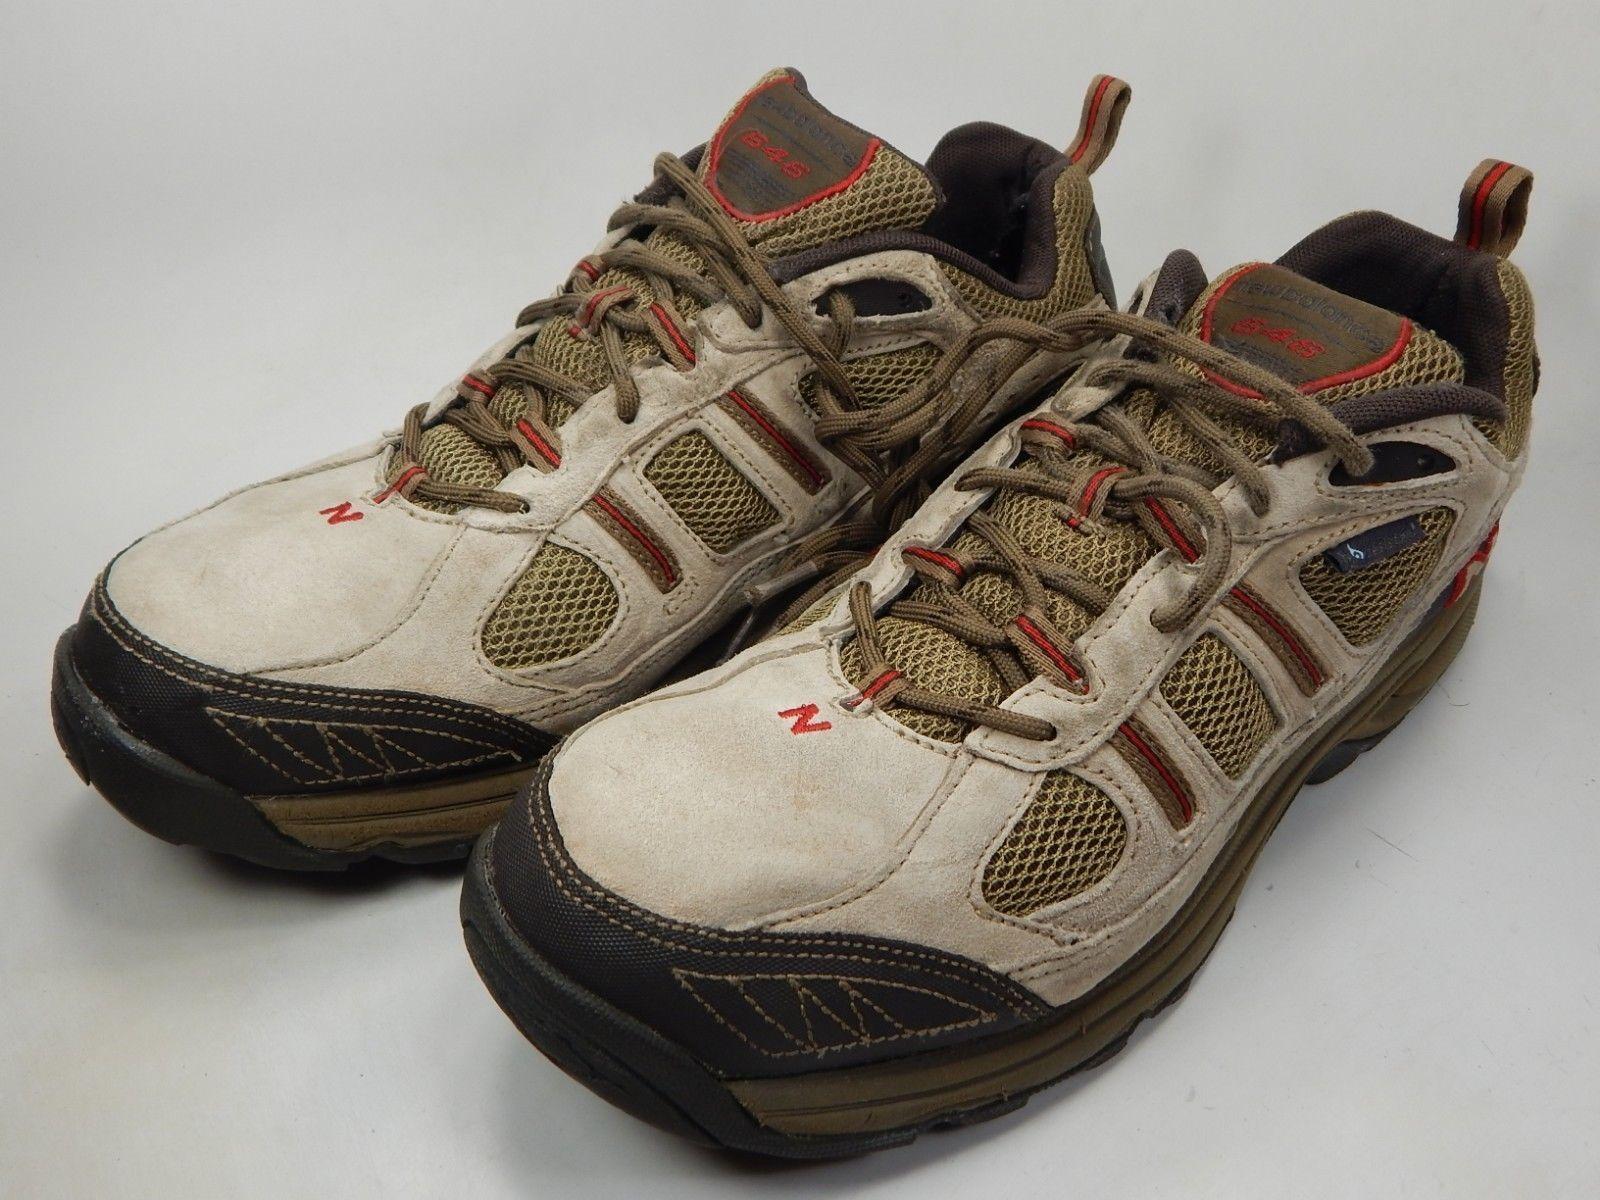 New Balance 646 Size 12.5 M (D) EU 47 Mens Walking Shoes Brown MW646BR